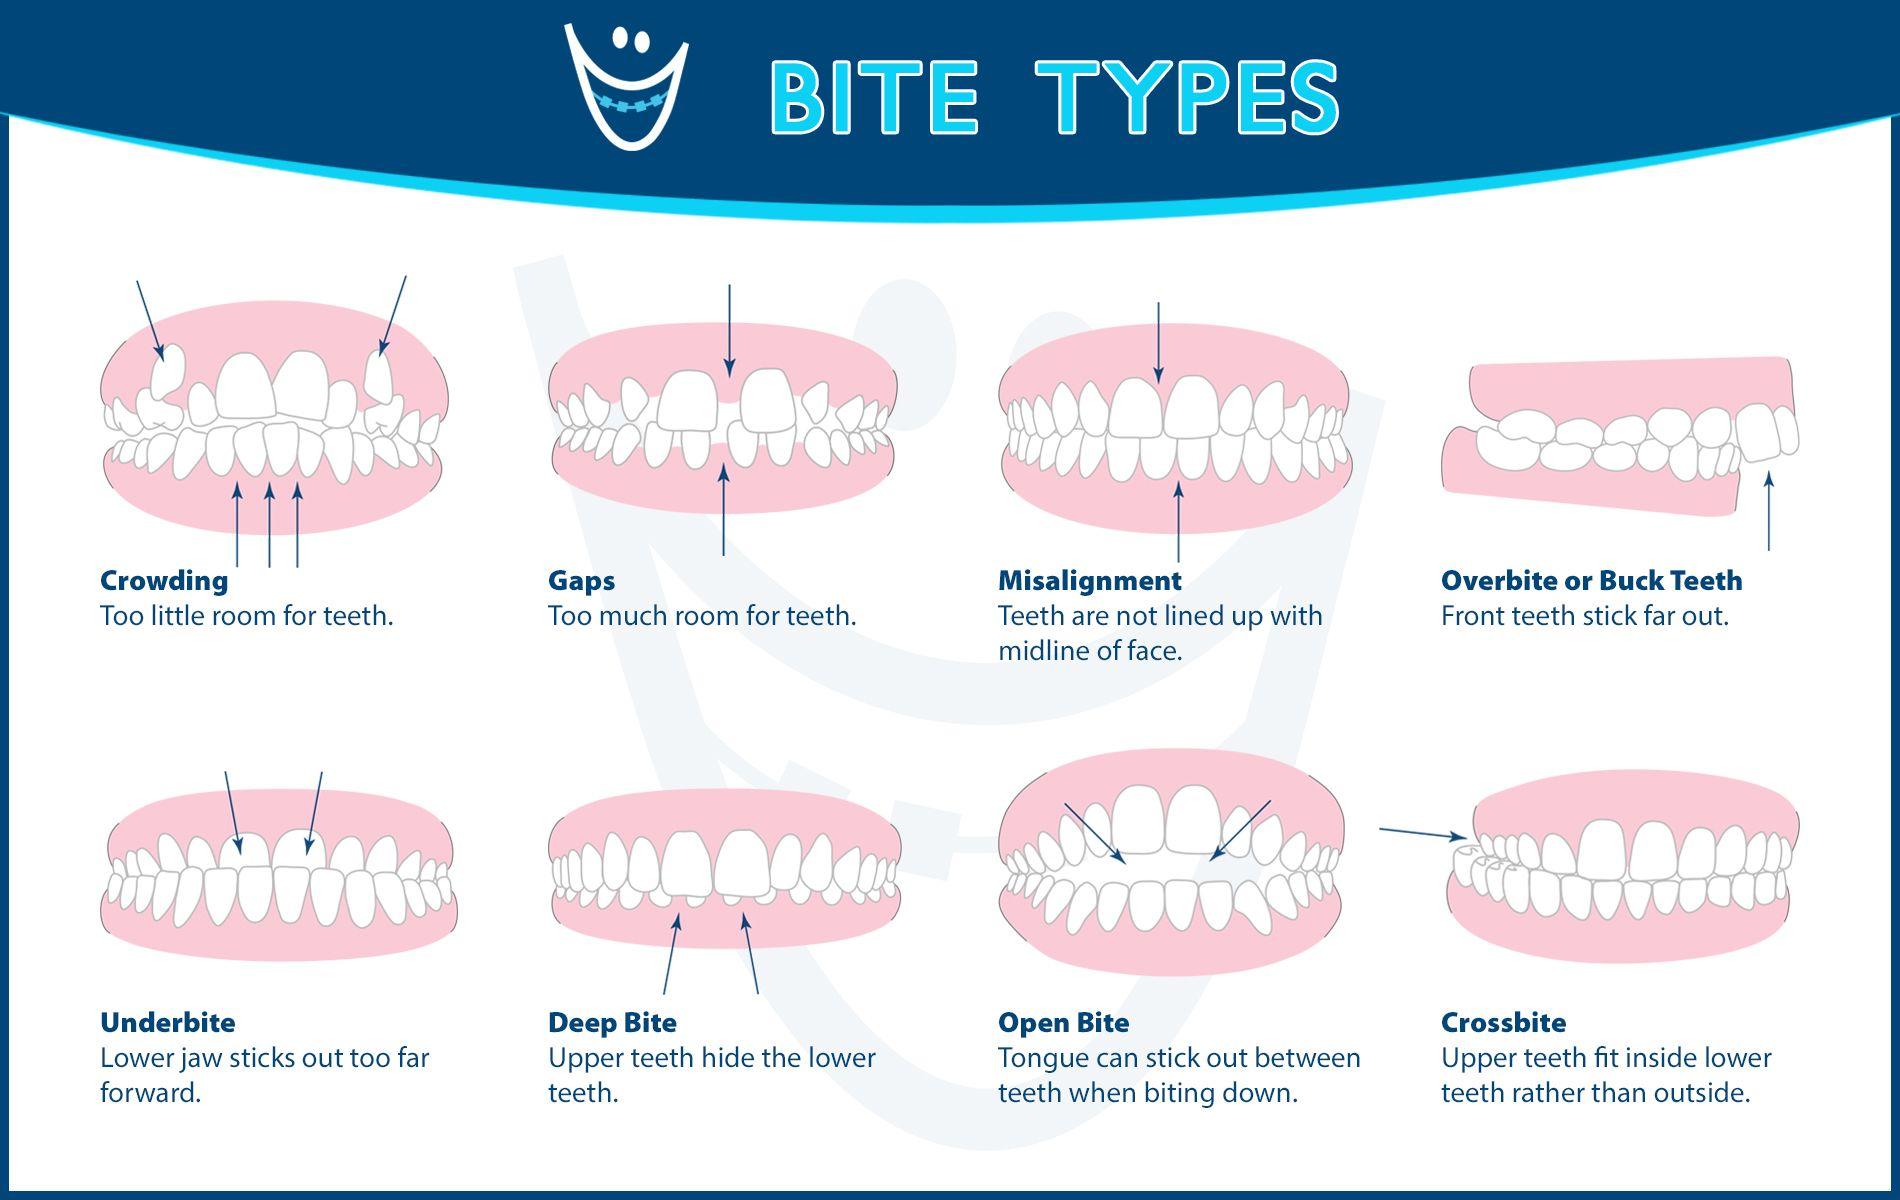 Understanding The Different Types Of Bites